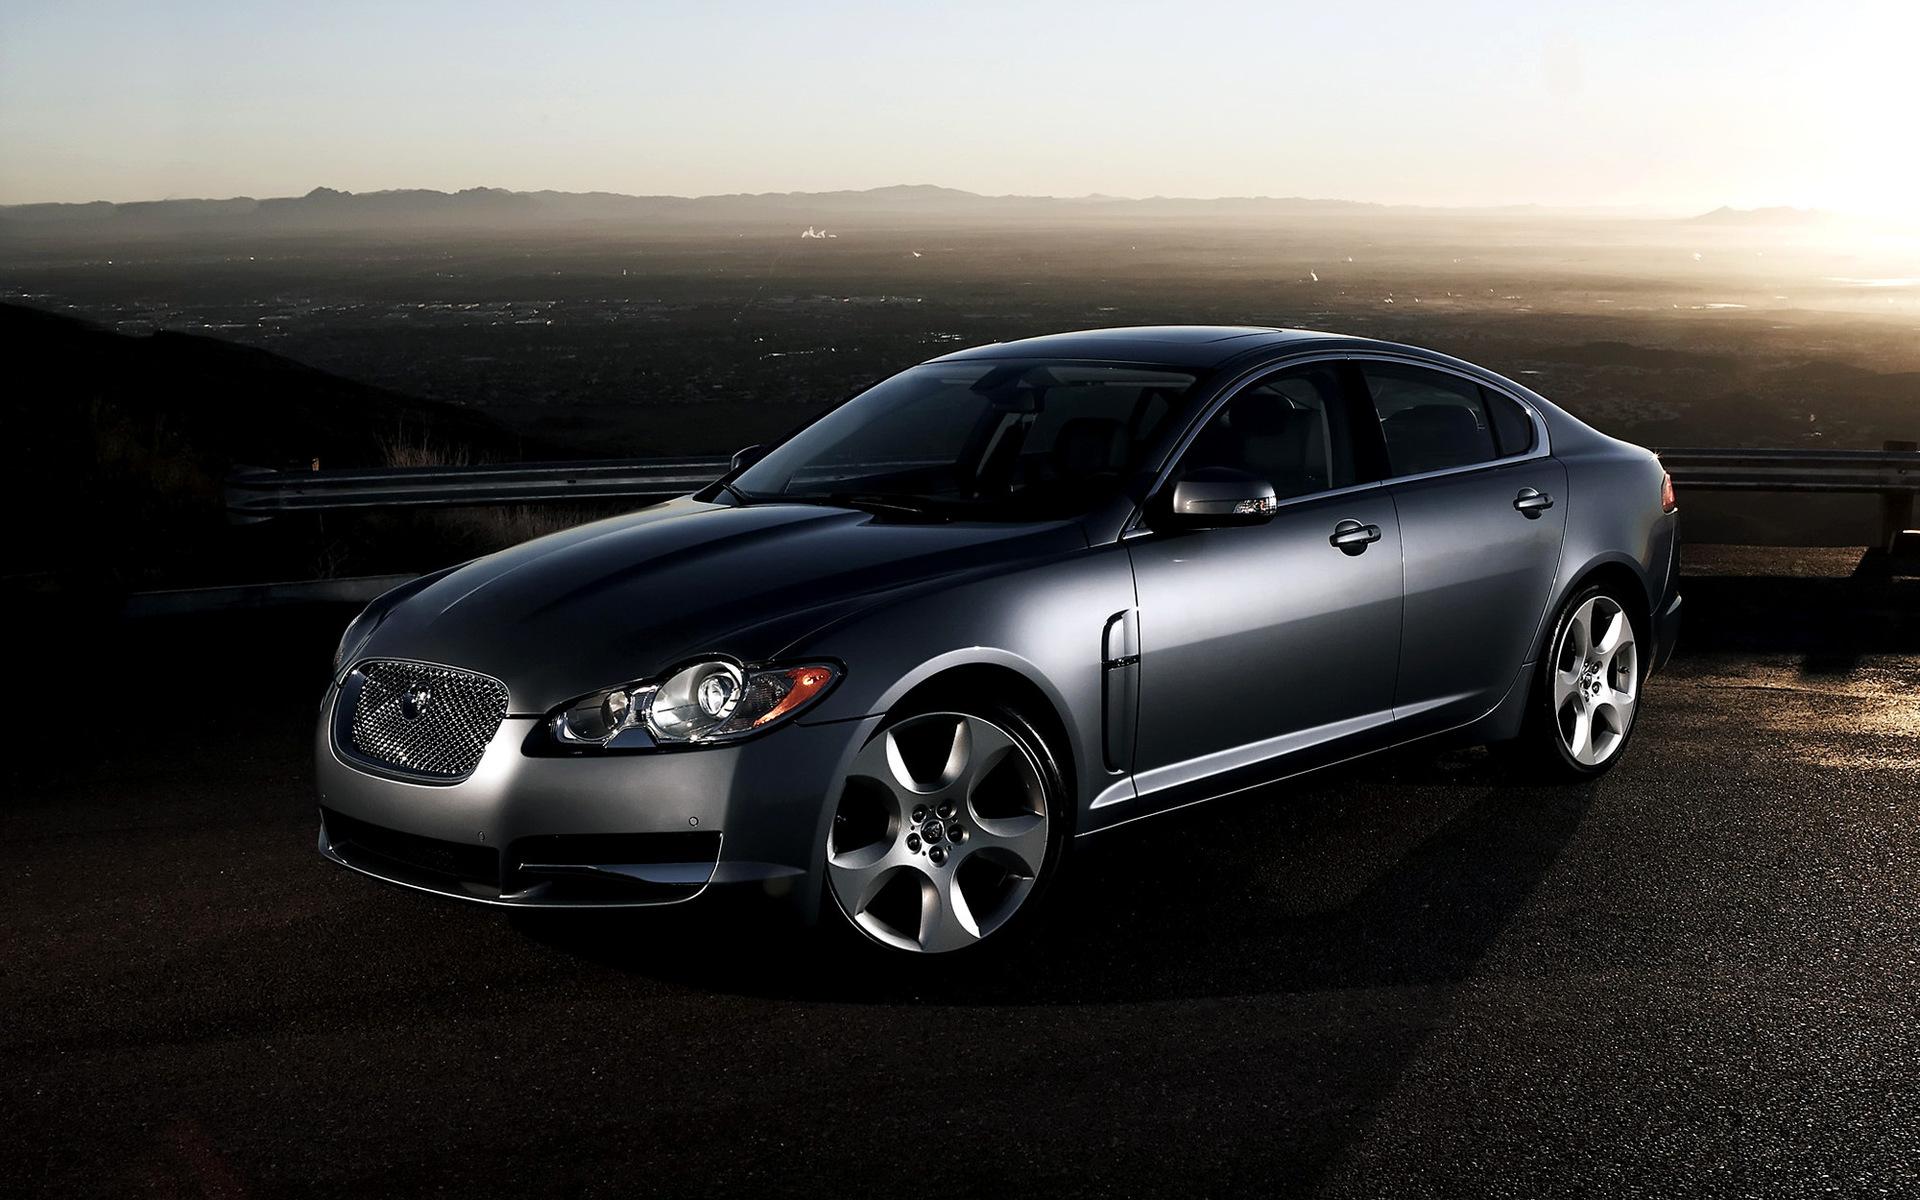 2008 Jaguar Xf Wallpapers And Hd Images Car Pixel